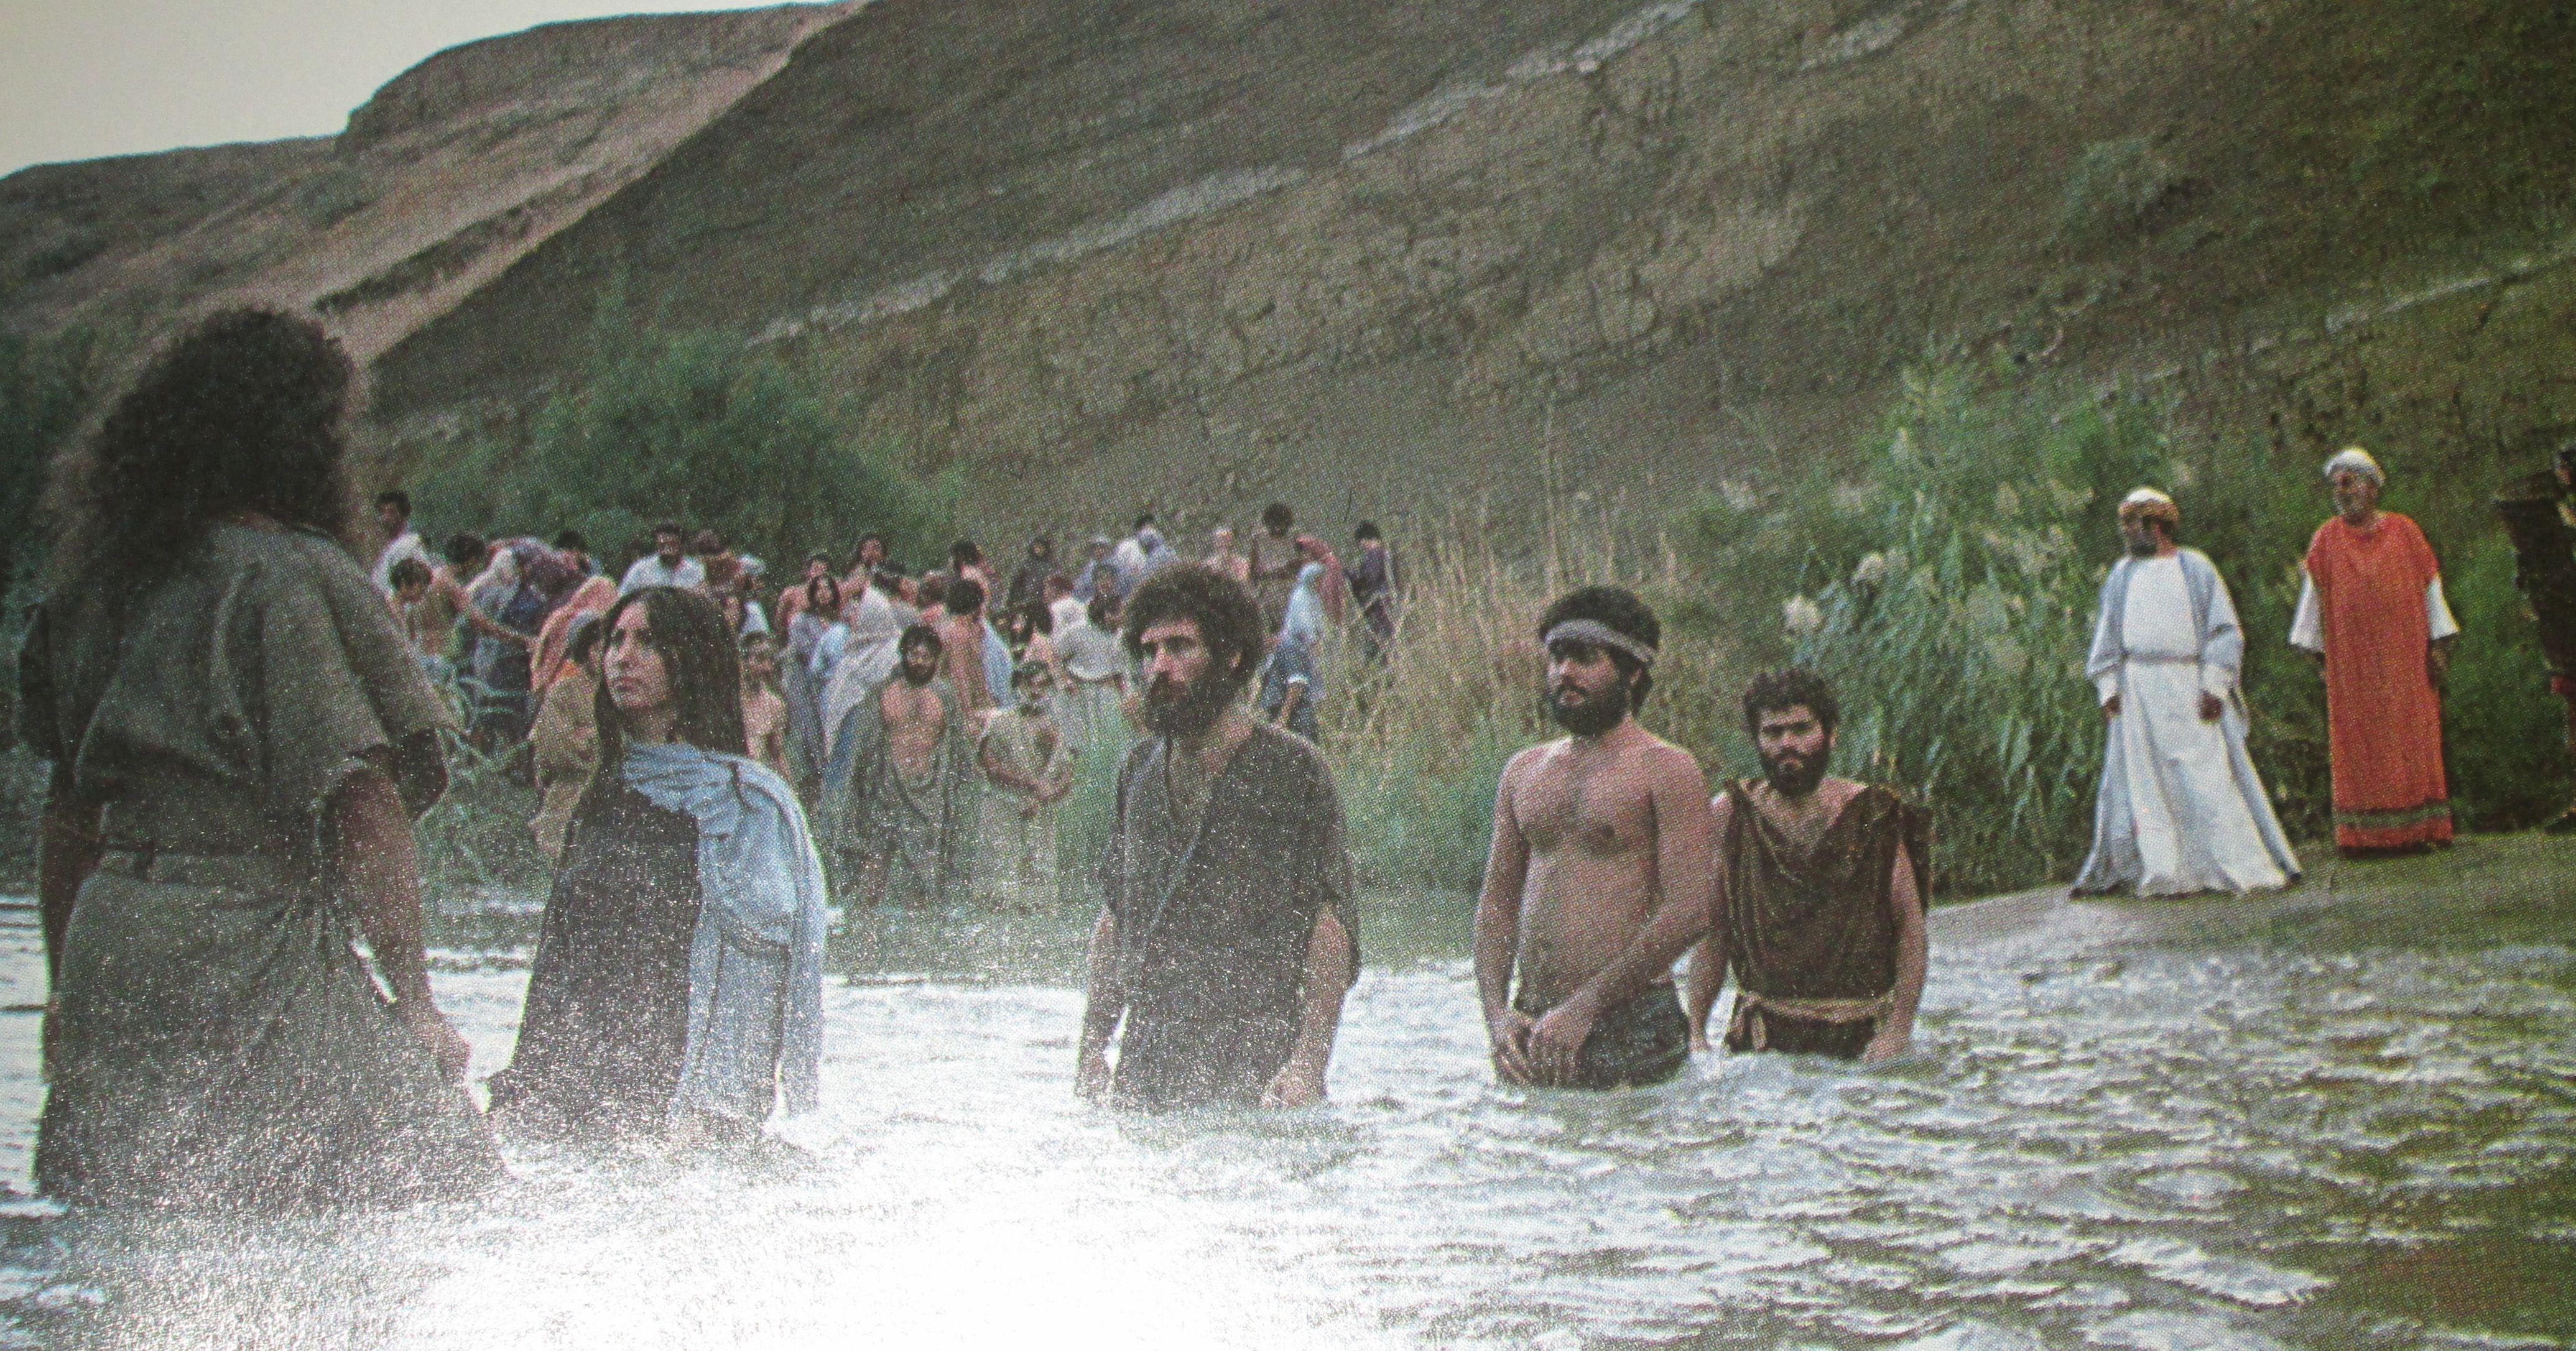 john the baptist scene at the river baptising people google